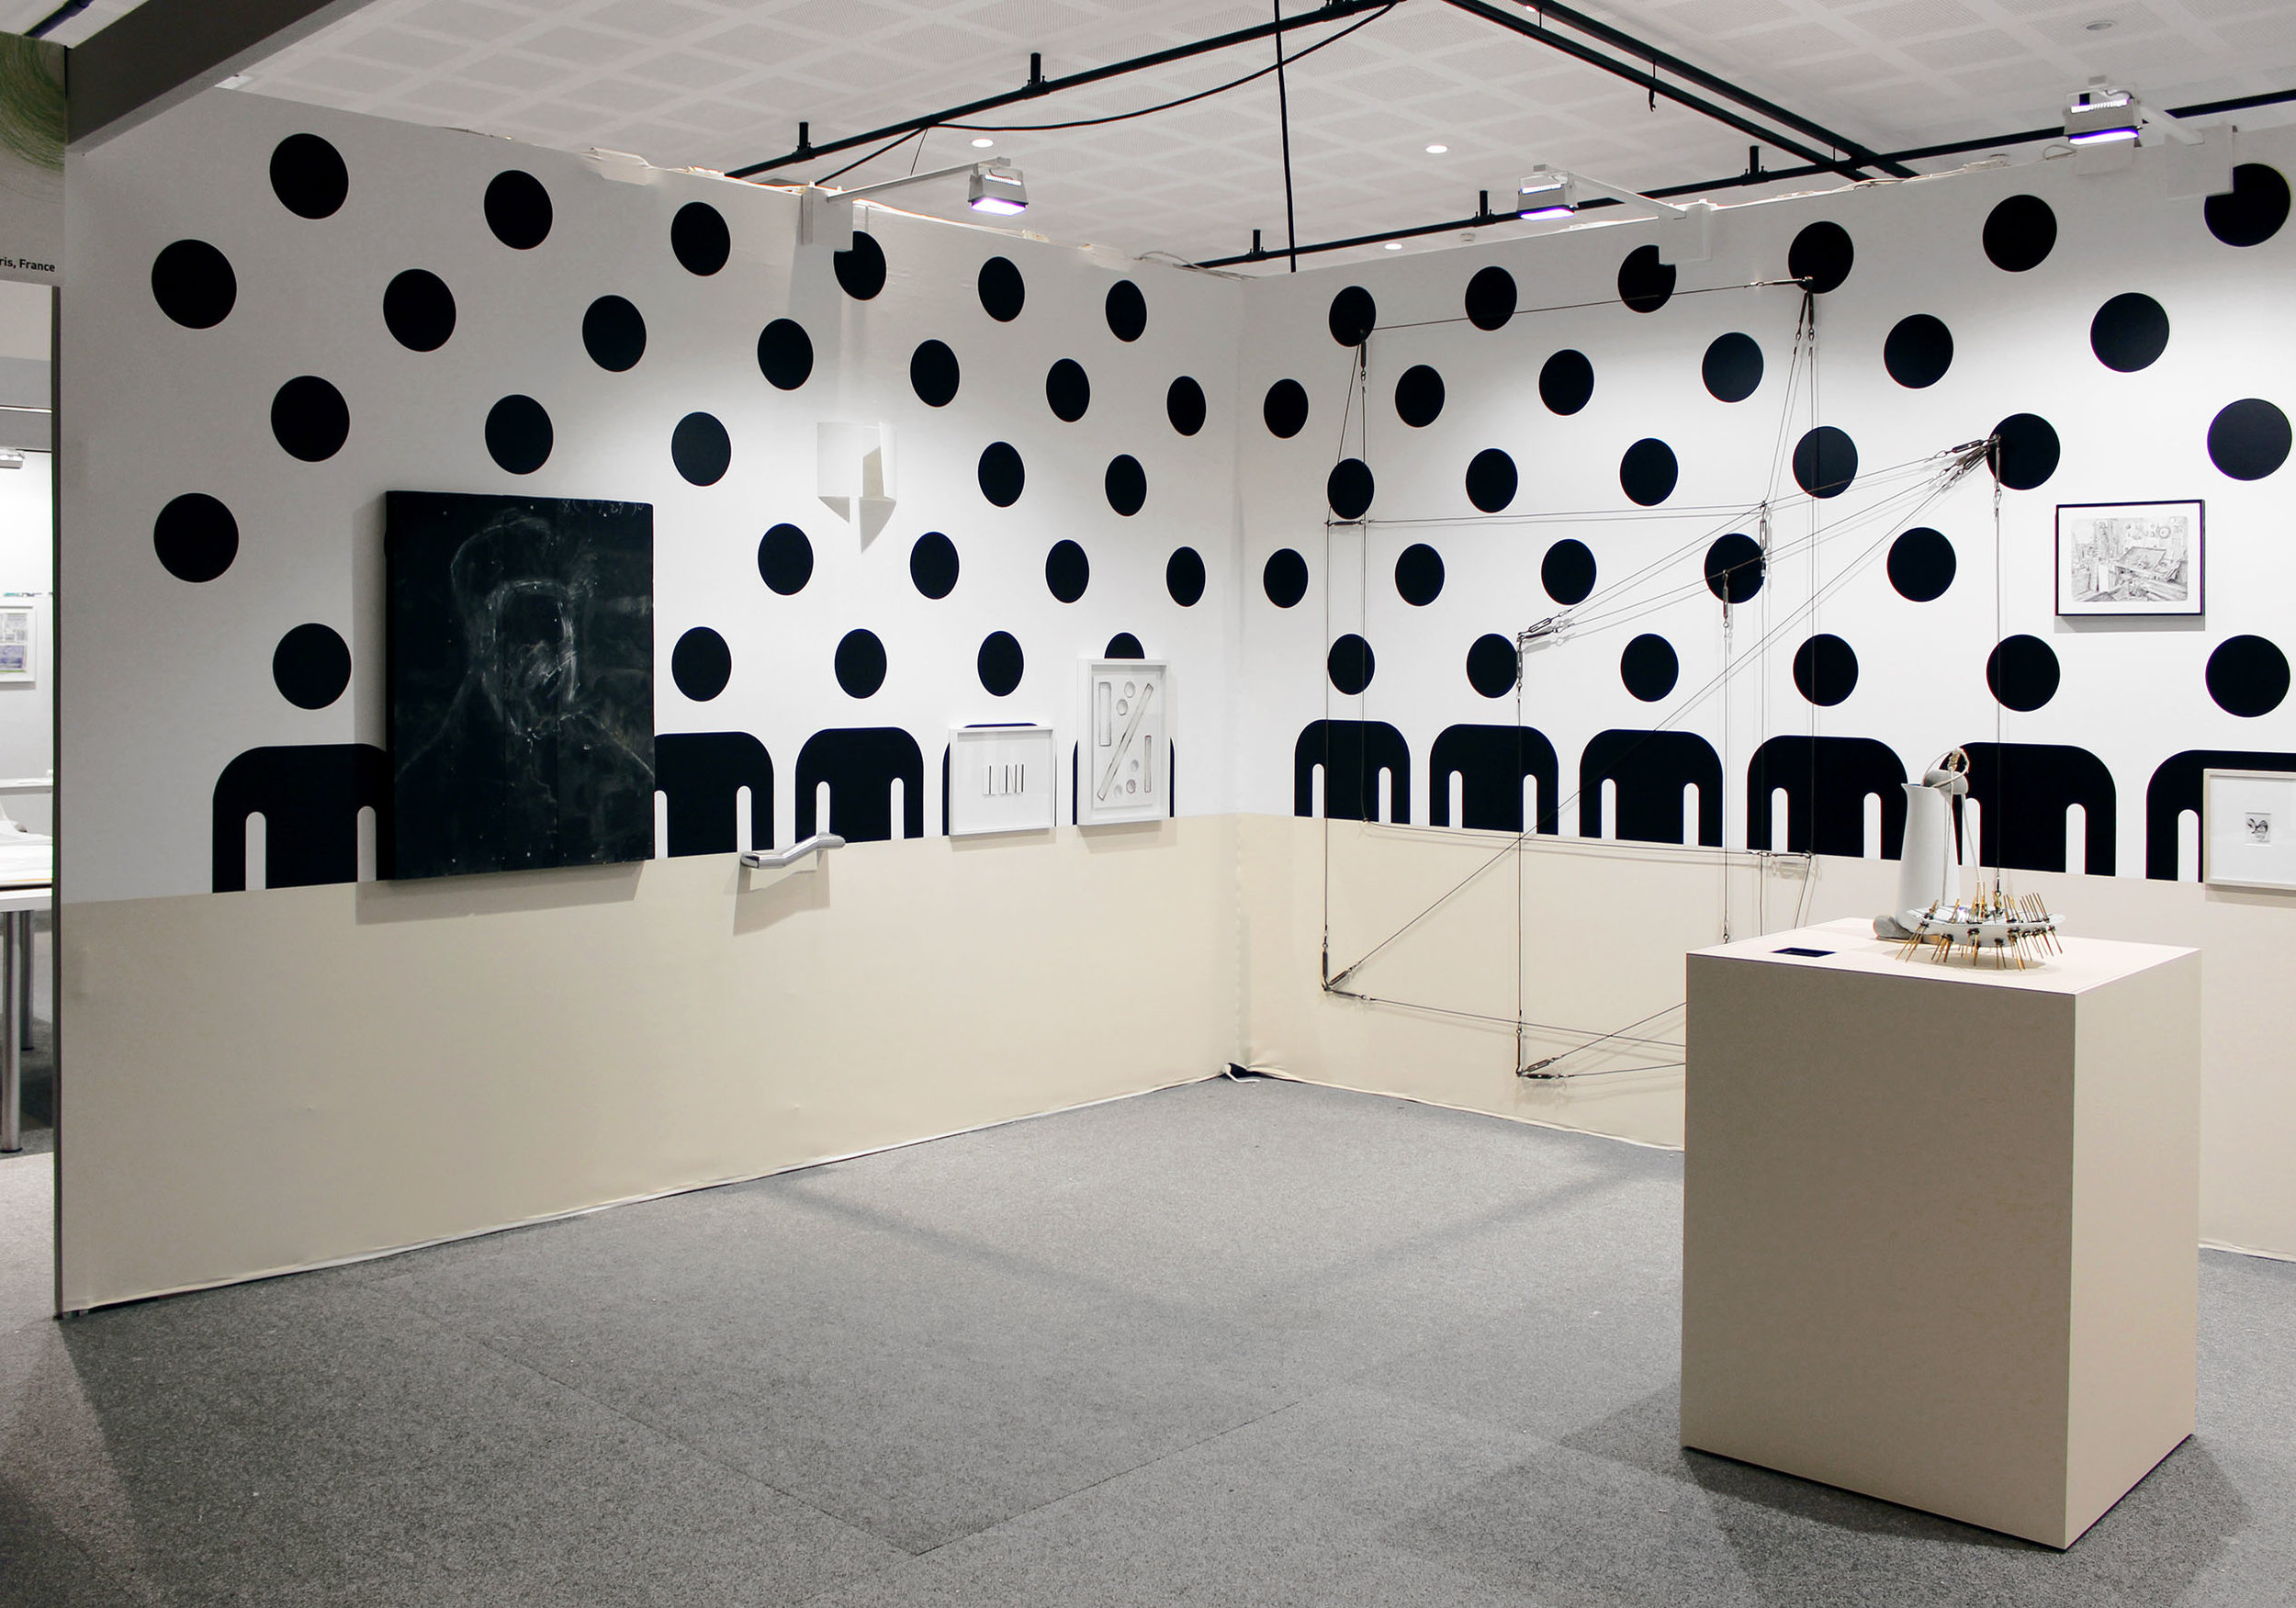 Michael Zelehoski. Installation in situ. câbles. Dimensions variables